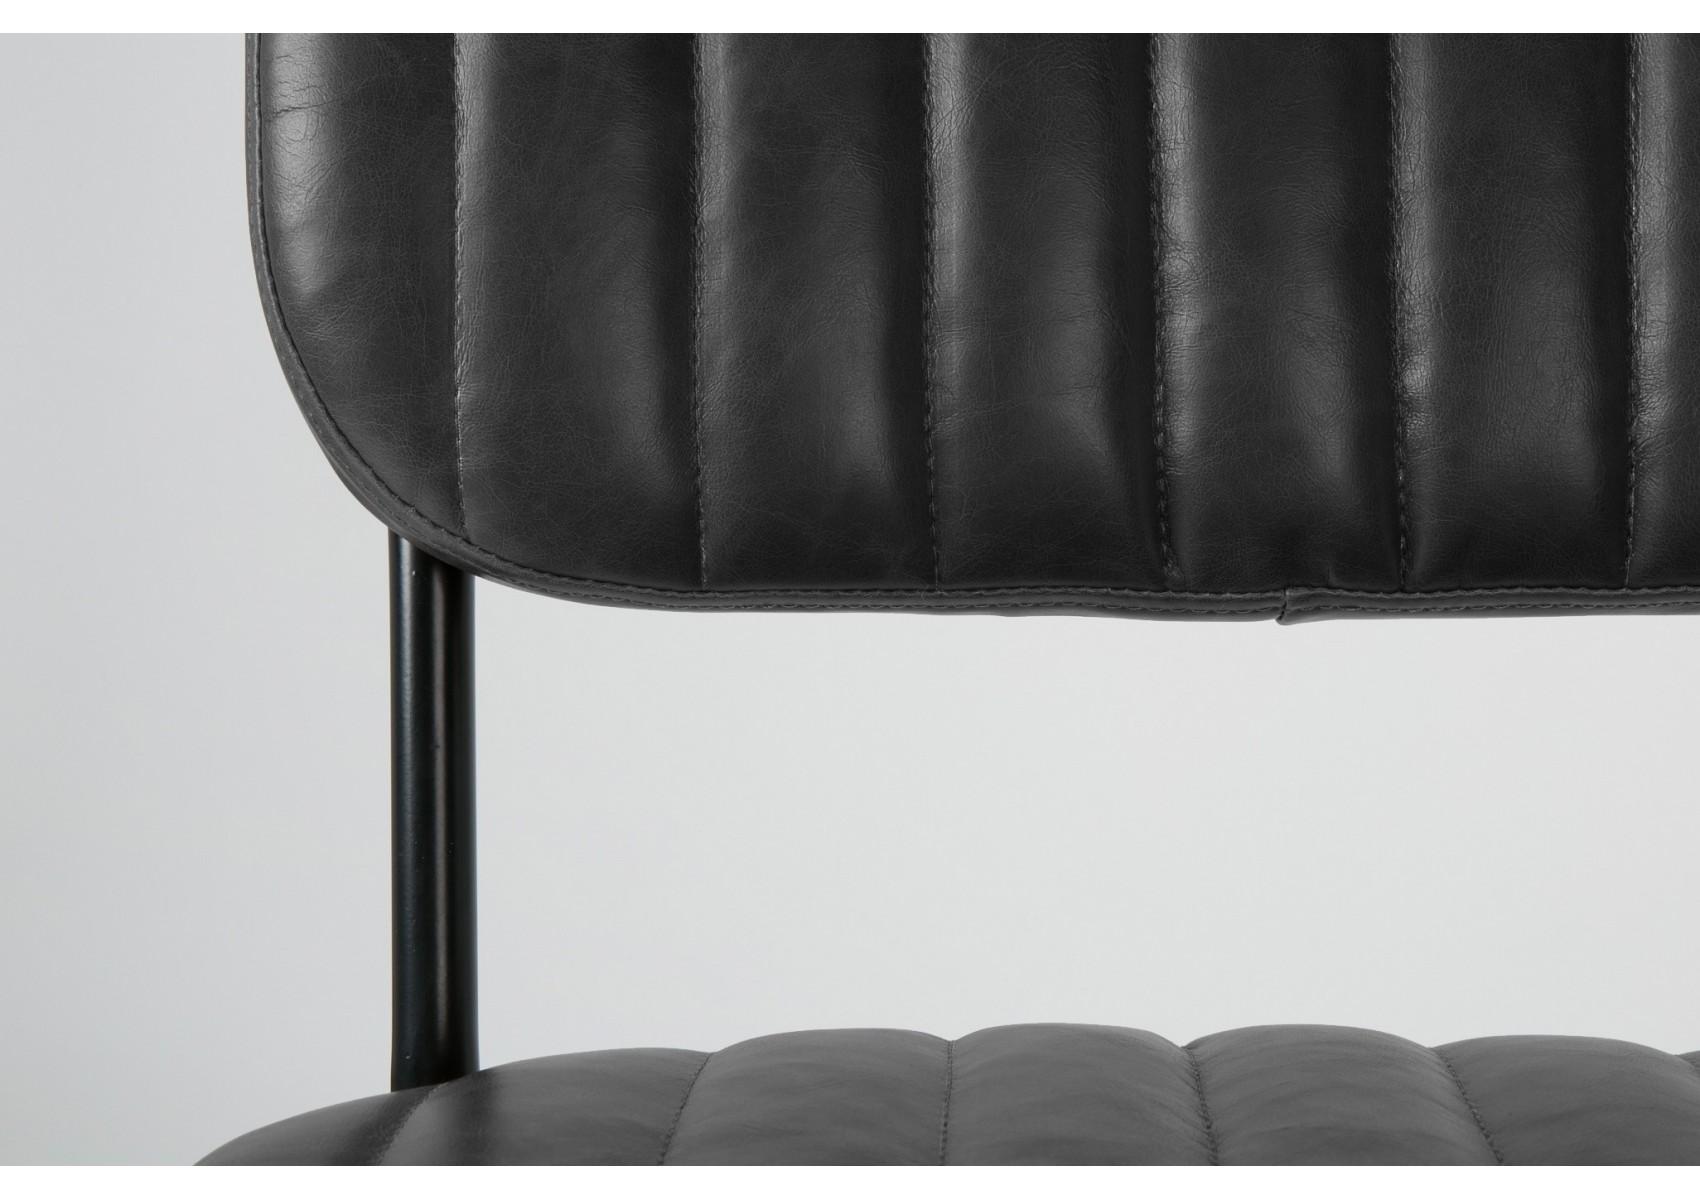 chaise design scandinave jake simili cuir boite design. Black Bedroom Furniture Sets. Home Design Ideas